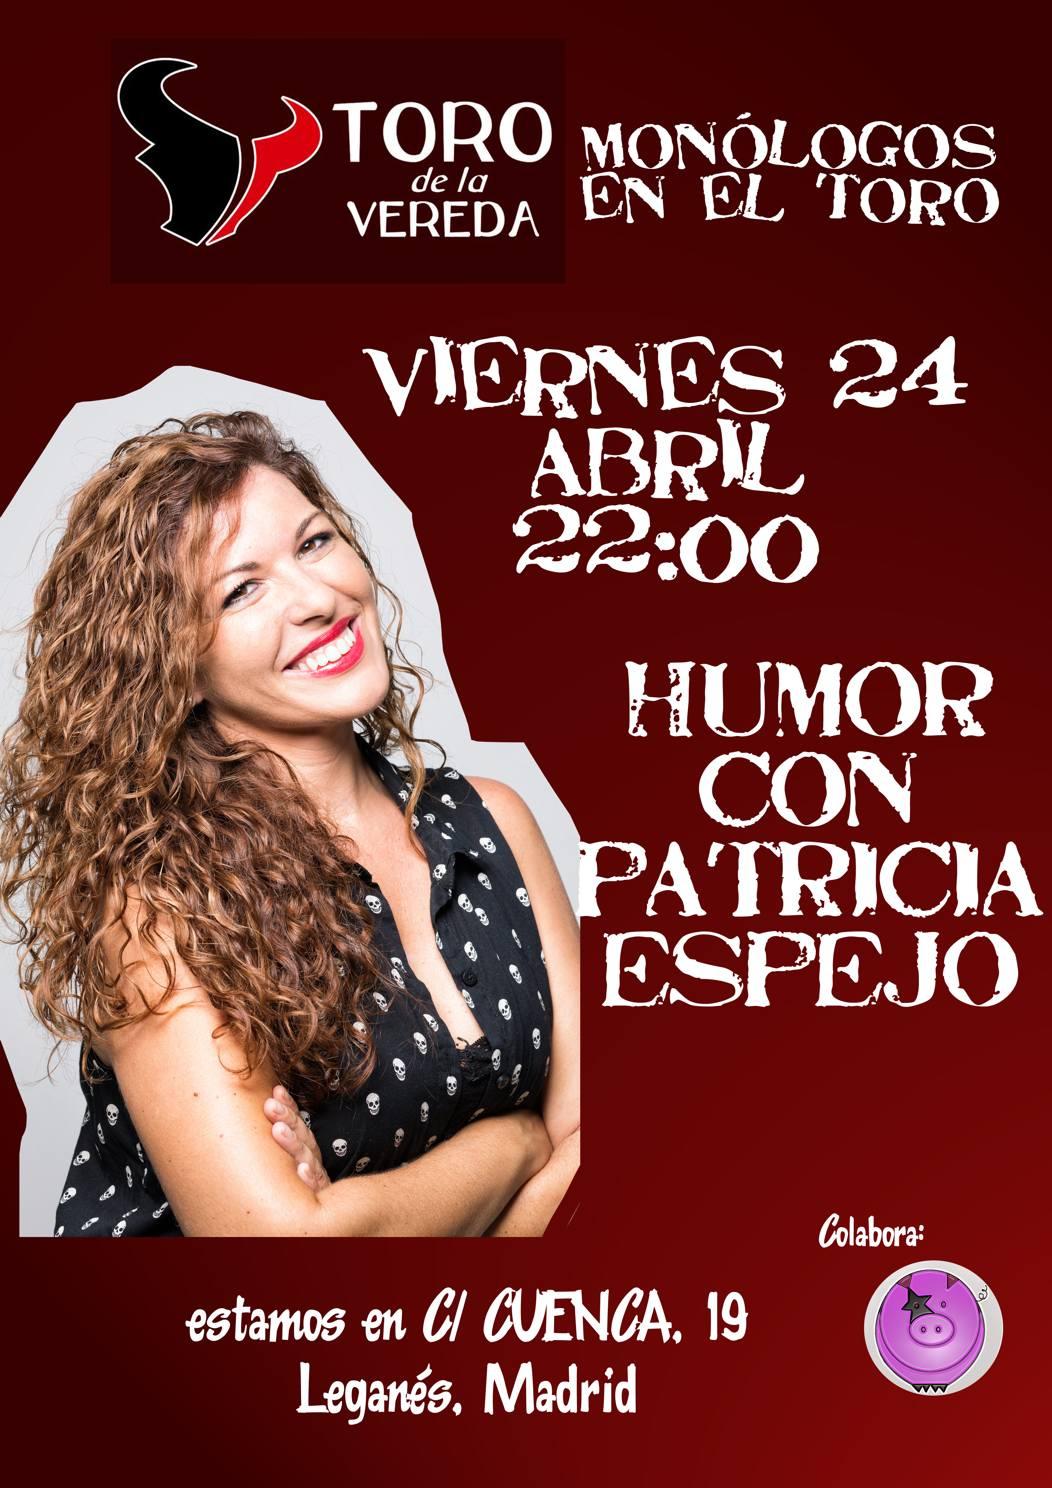 ¡Patricia Espejo en El Toro de la Vereda!